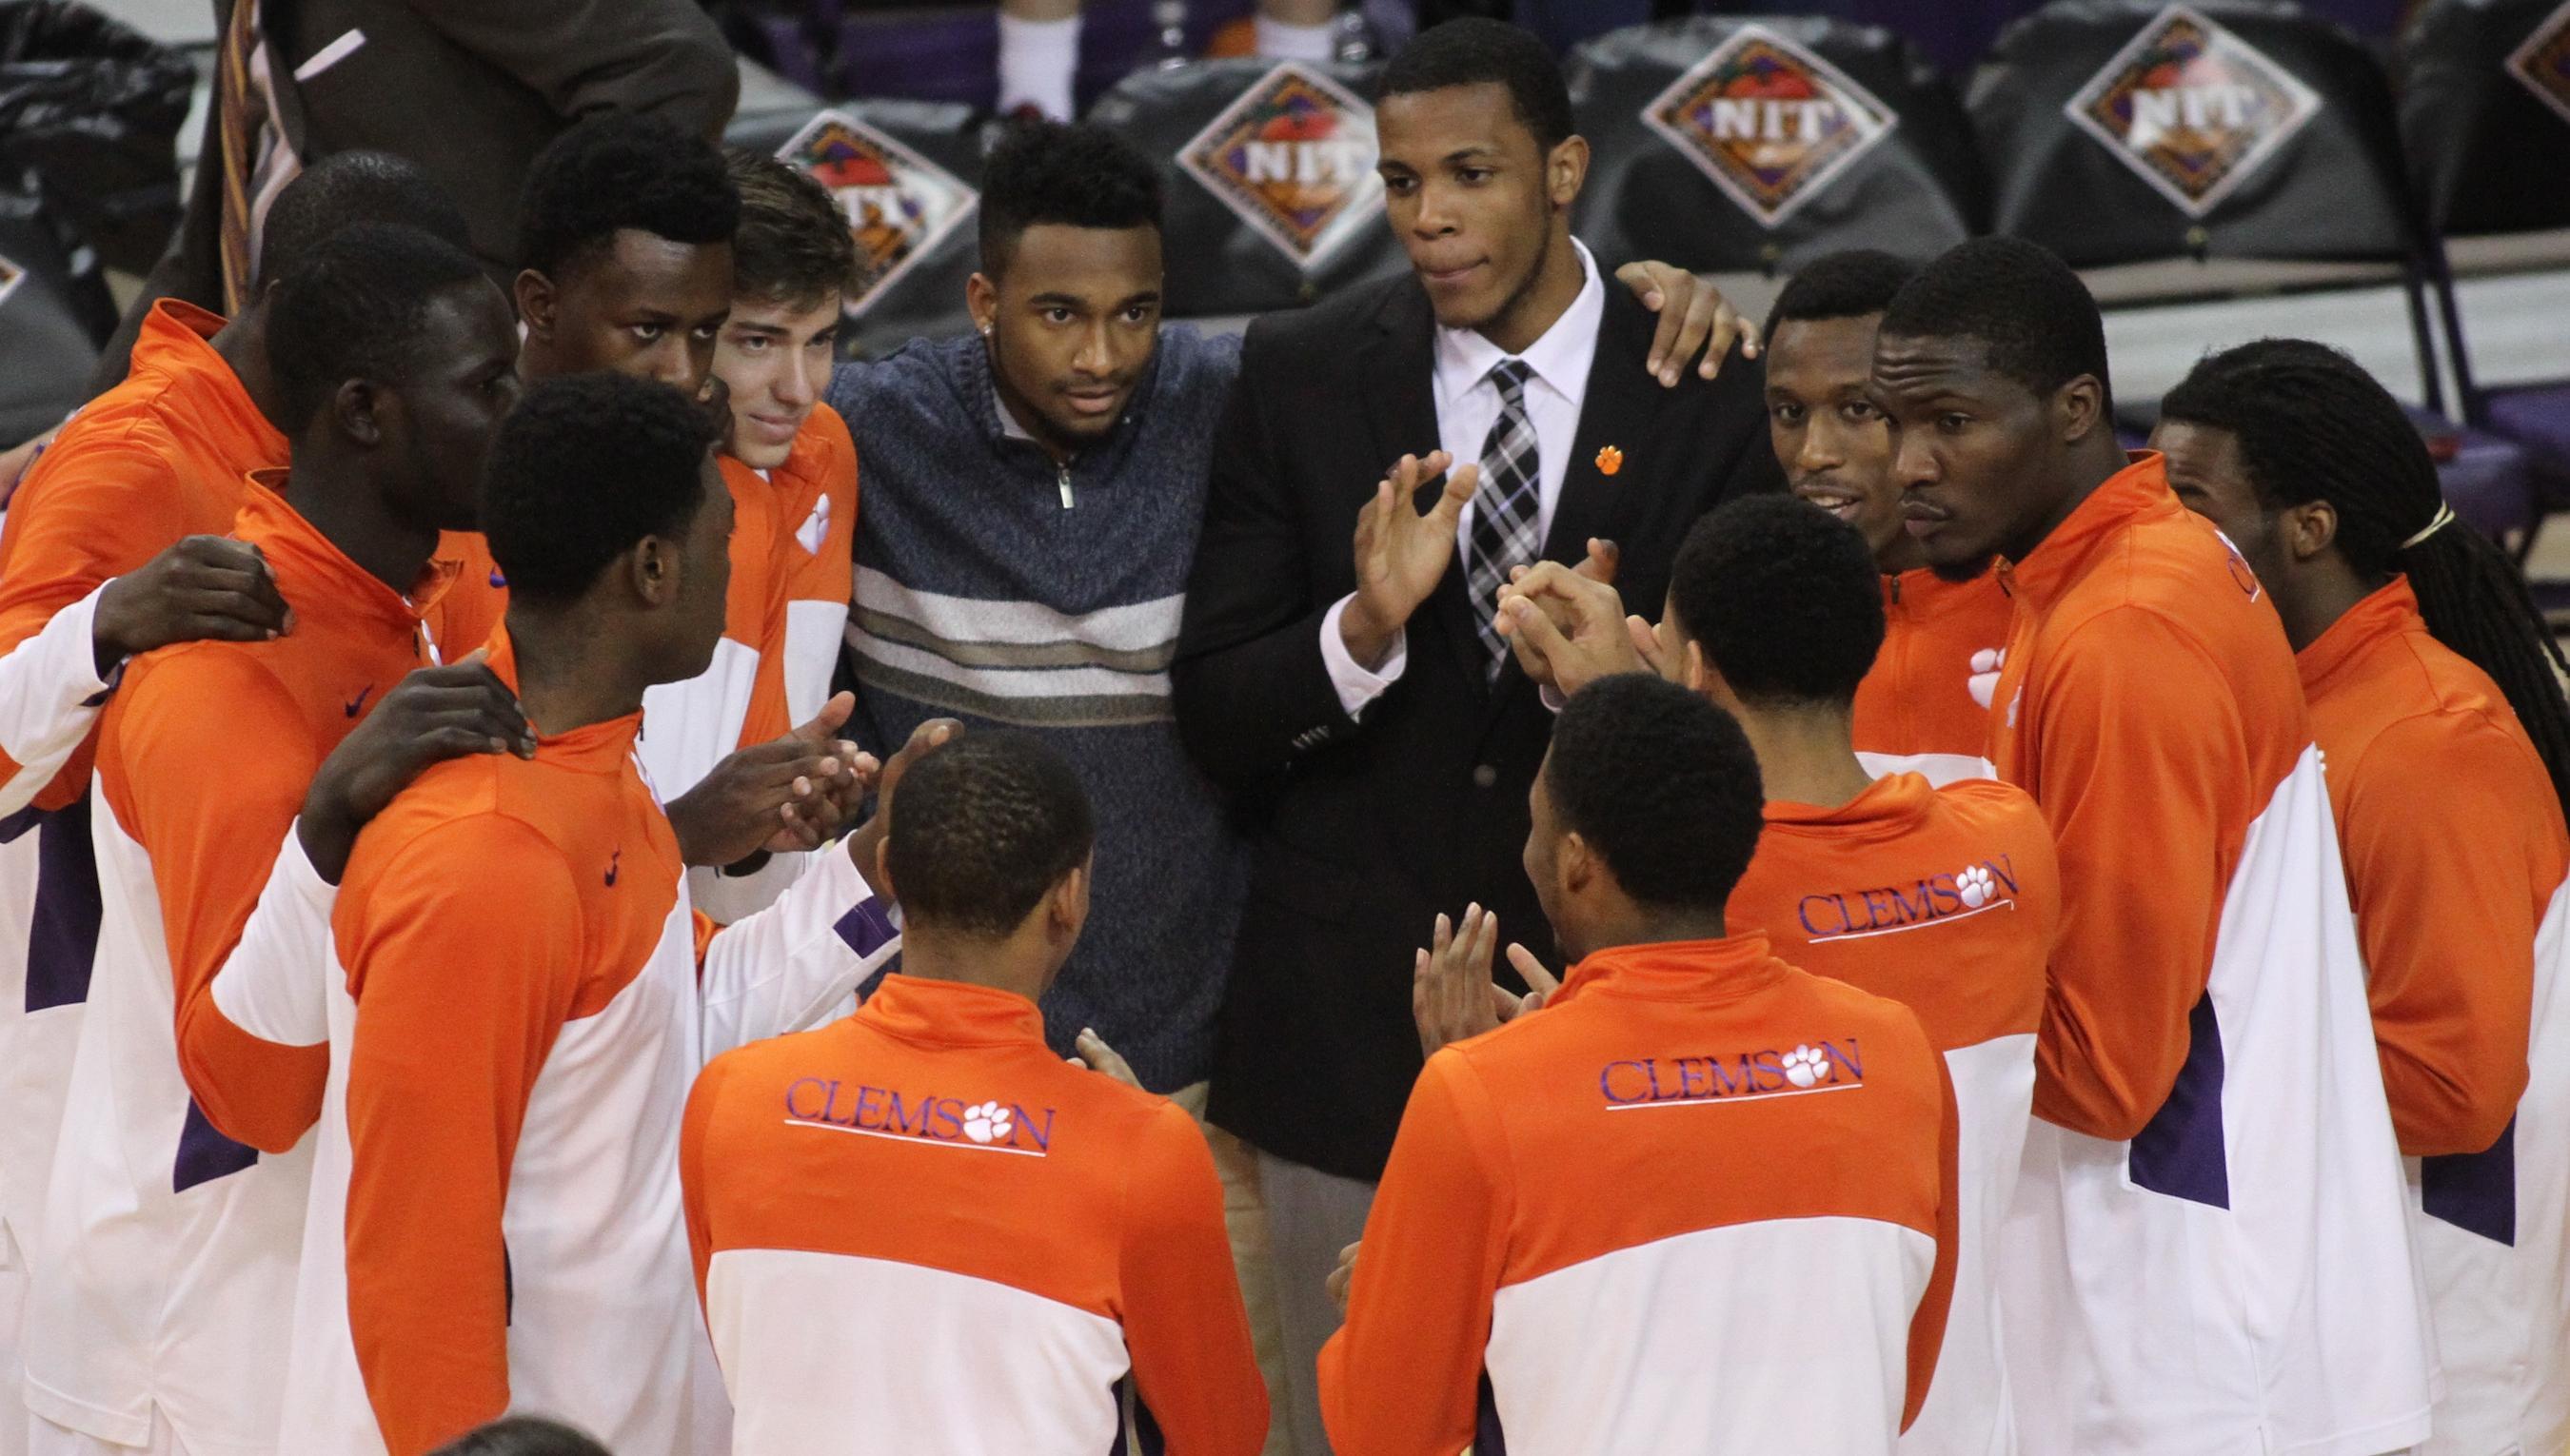 Clemson Basketball All-Access – NIT vs. Illinois